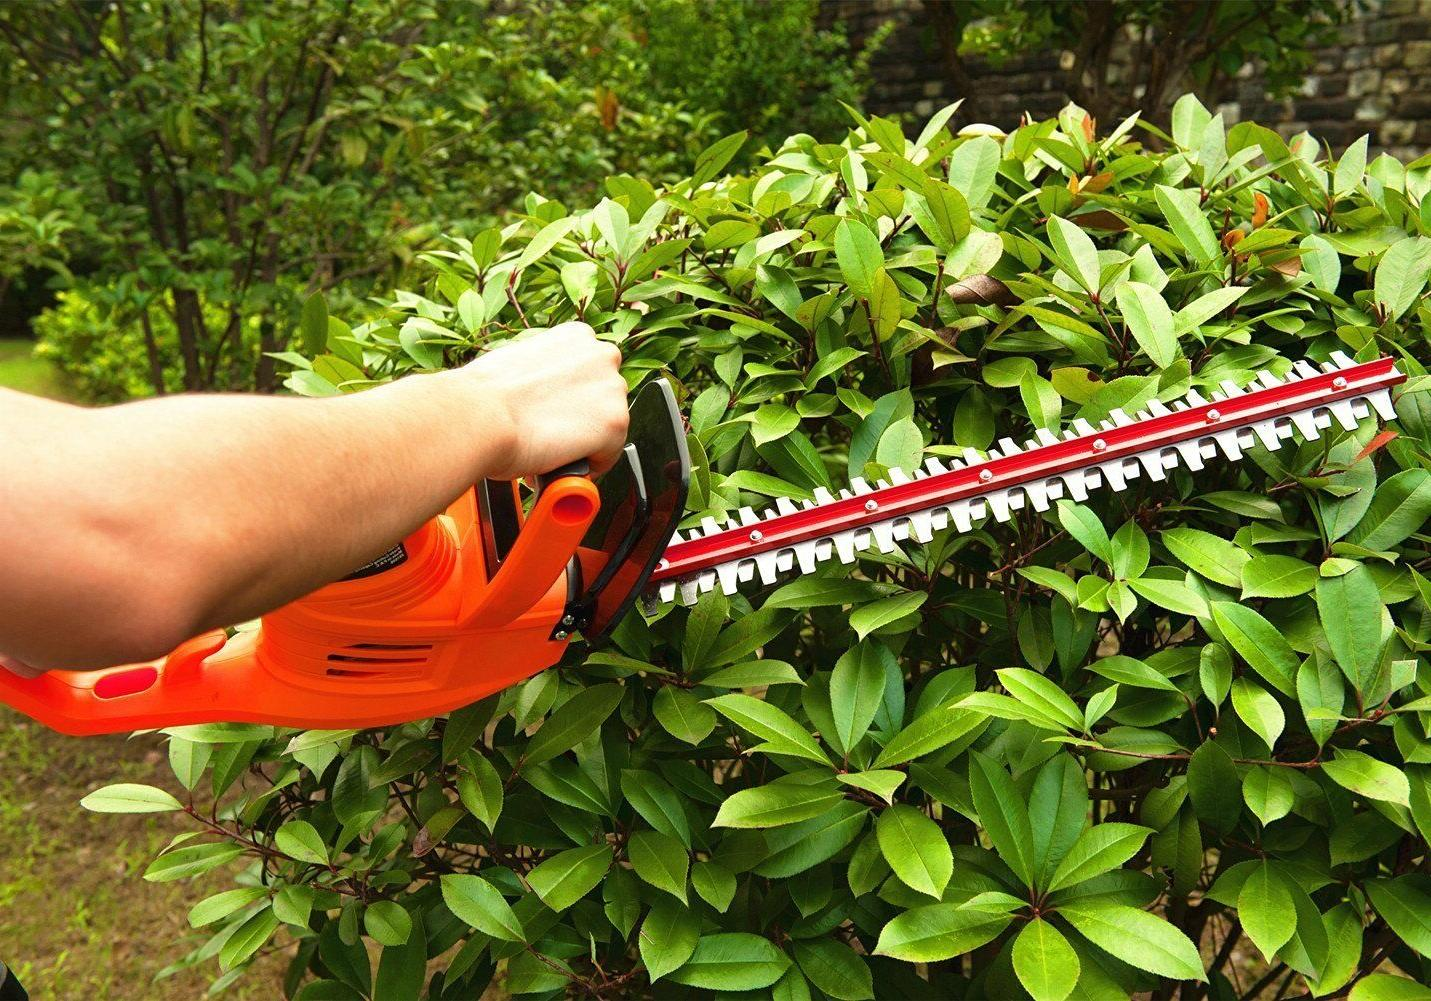 Garcare 4.2-Amp Hedge